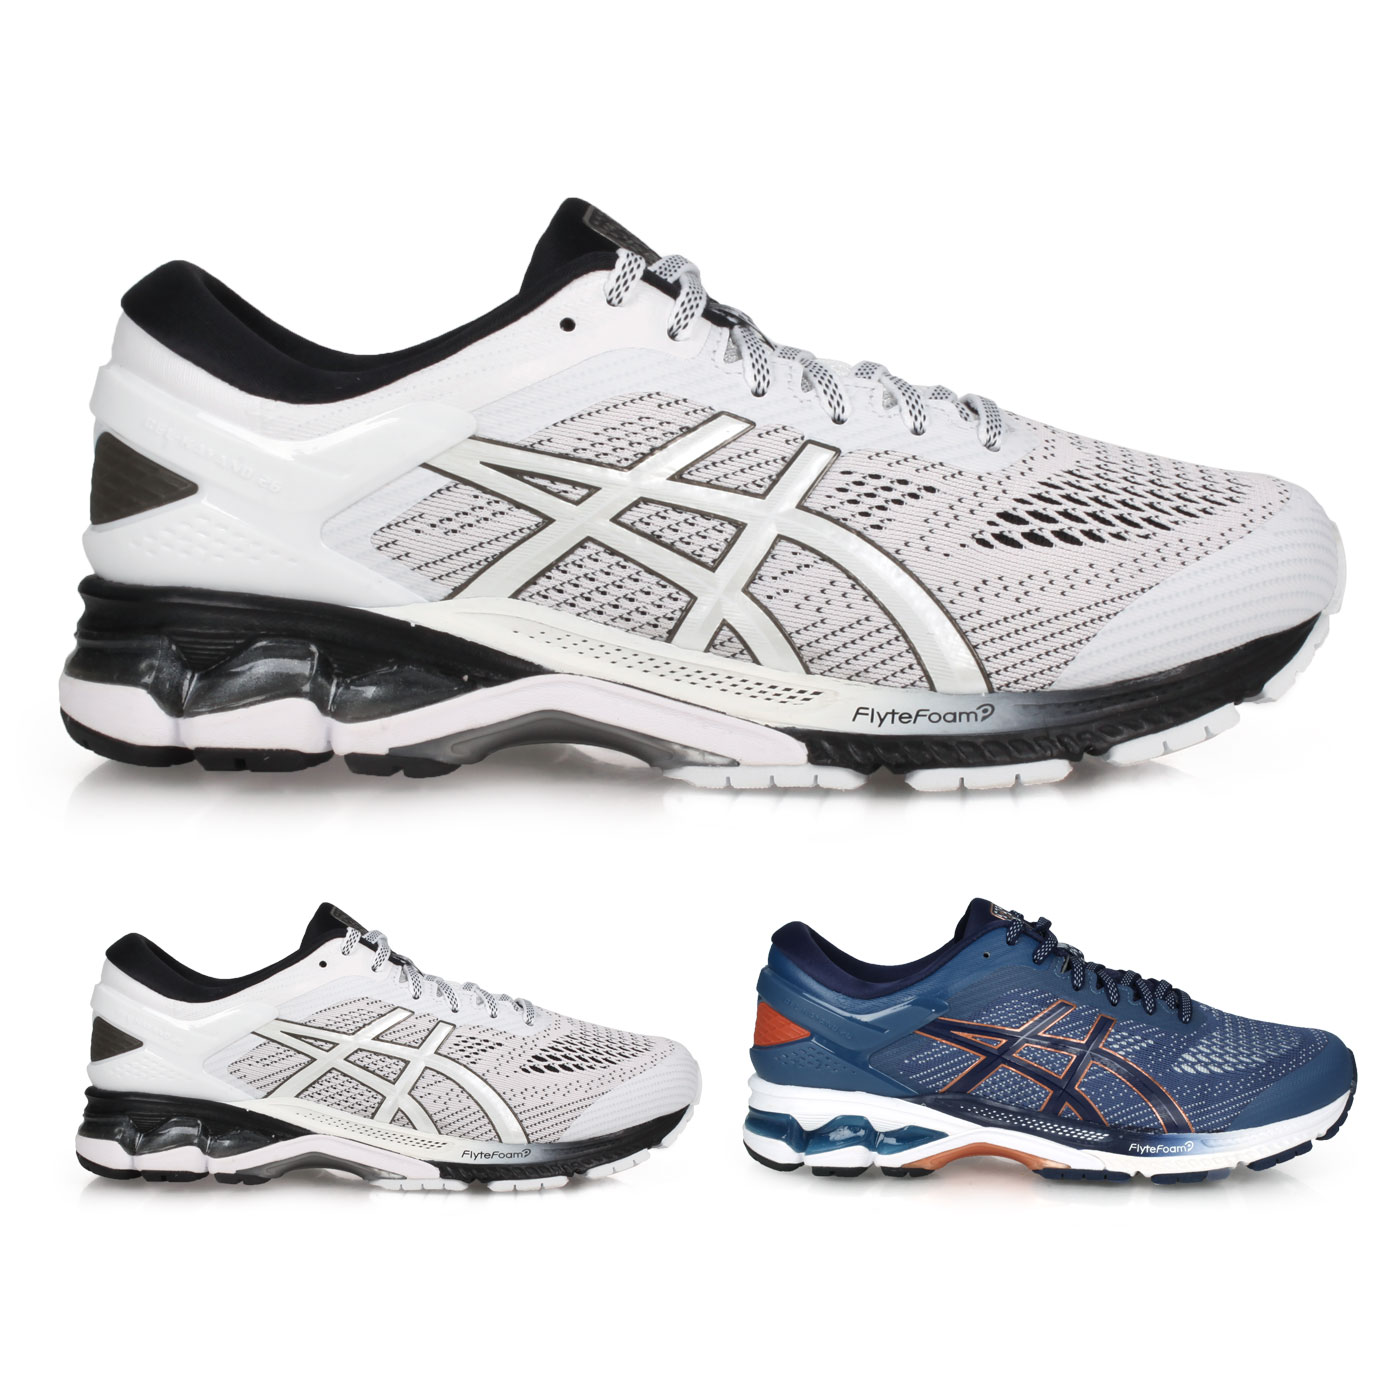 ASICS 男款慢跑鞋  @GEL-KAYANO 26@1011A541-101